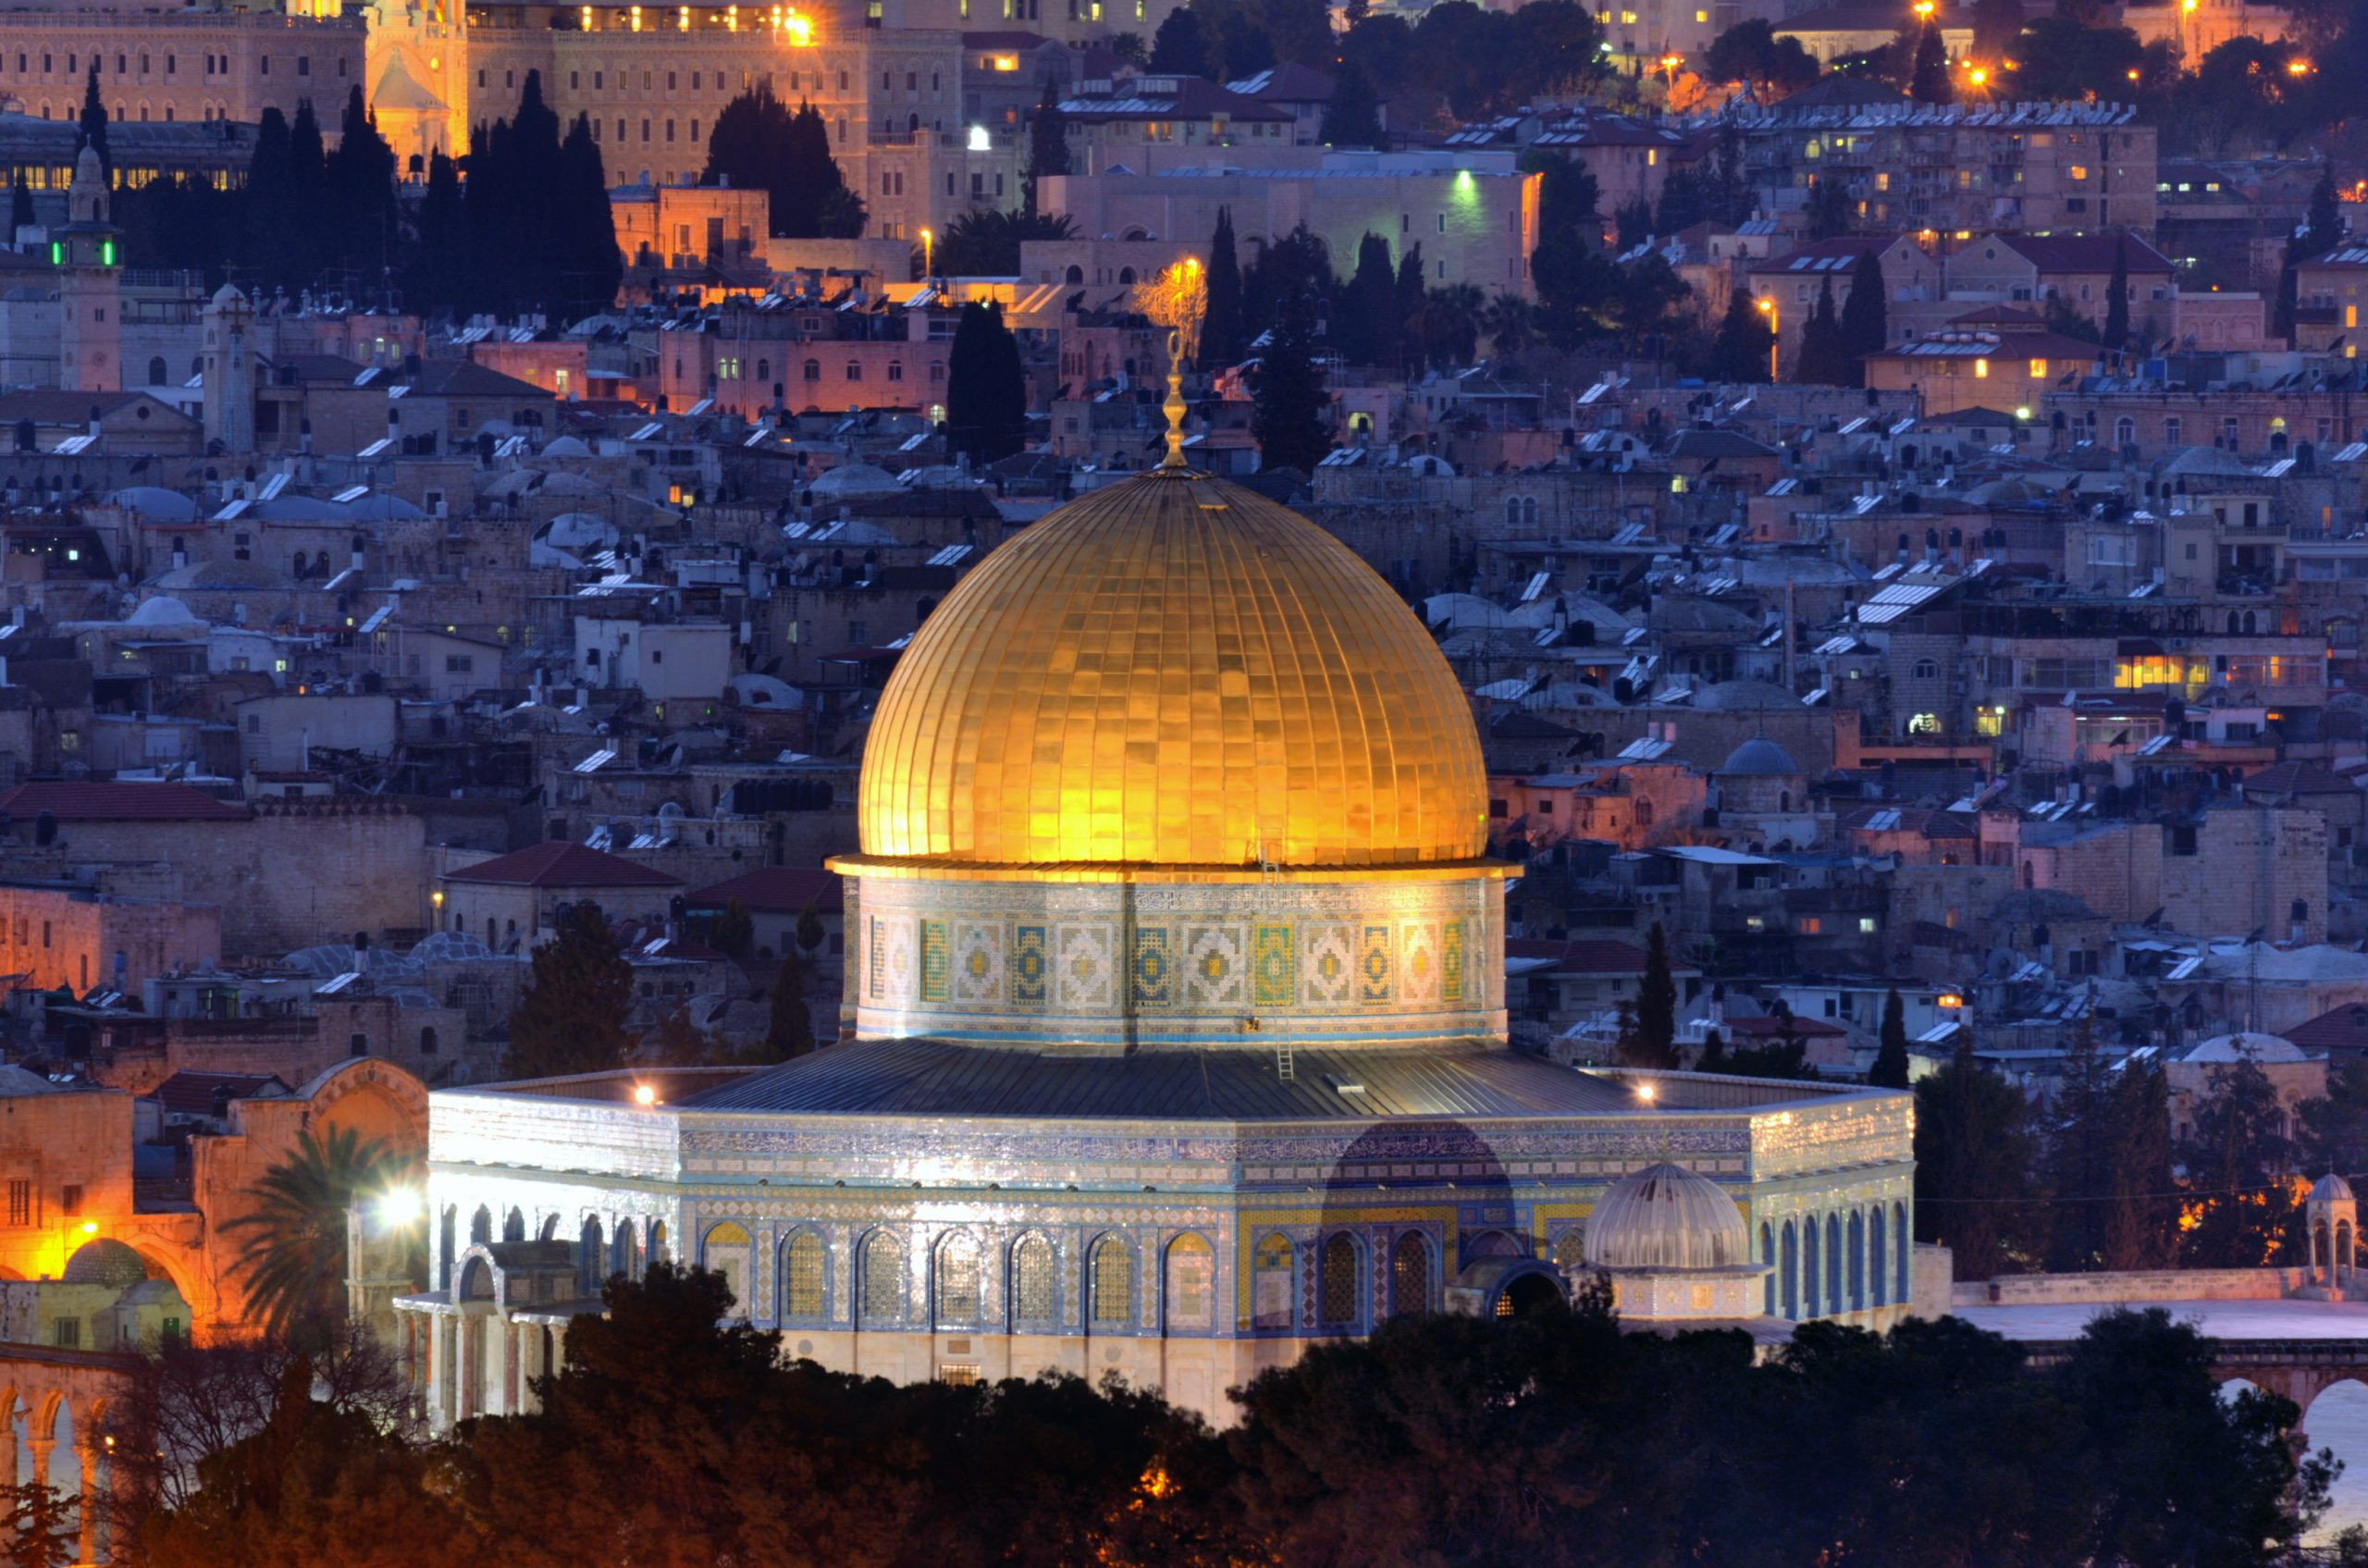 Israel's prime minister has no plans to change rules at sacred Jerusalem site